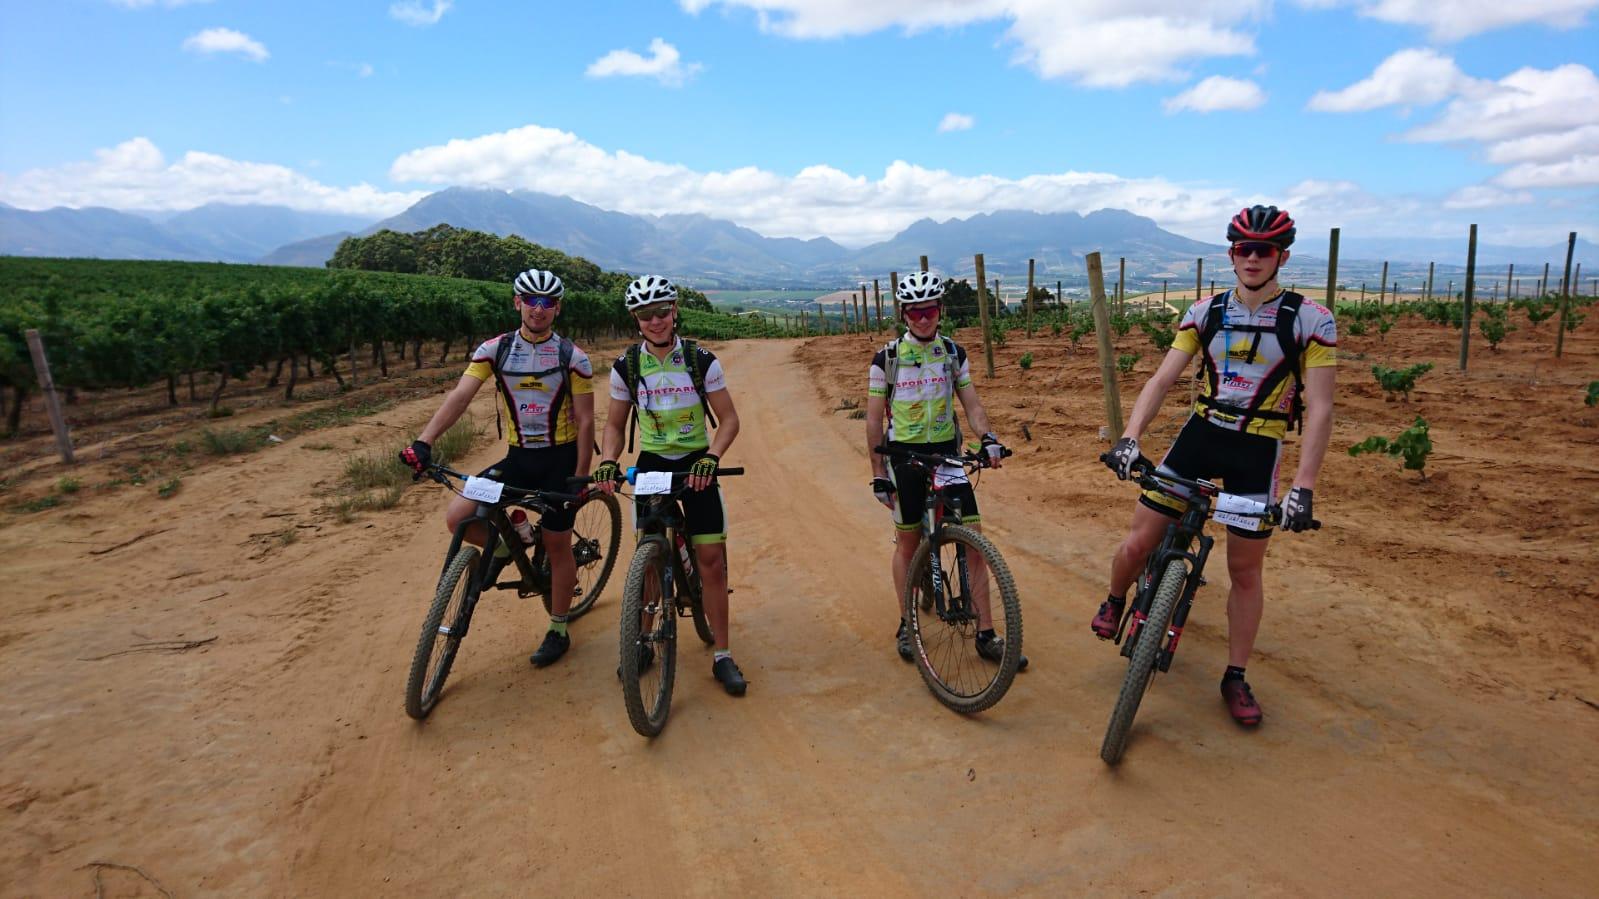 Junge Mountainbiker in Südafrika